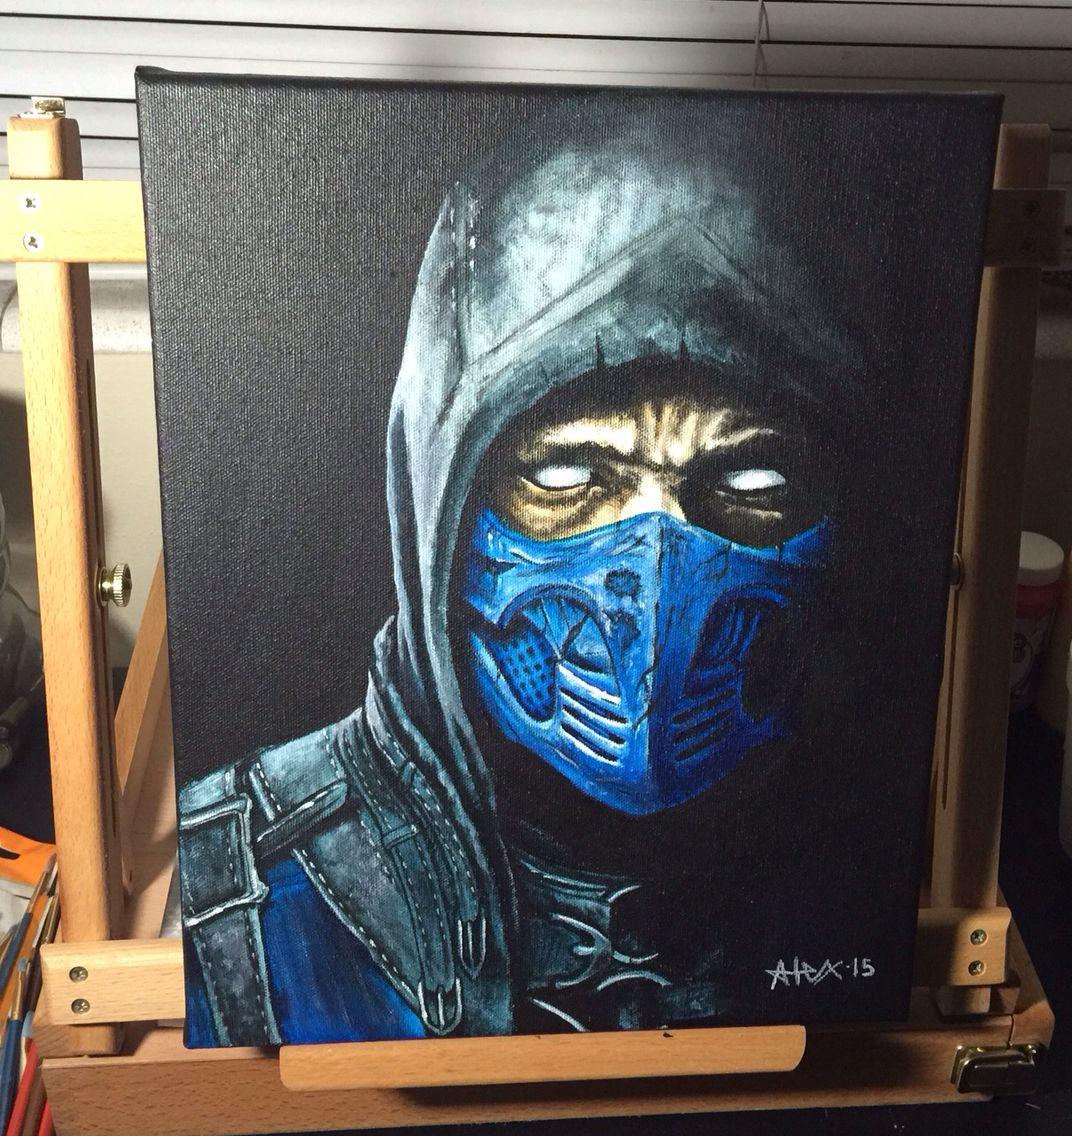 Subzero From Mortal Kombat Acrylic Painting By My Husband Alex Ellis Alexellistattoo Painting Art Drawings